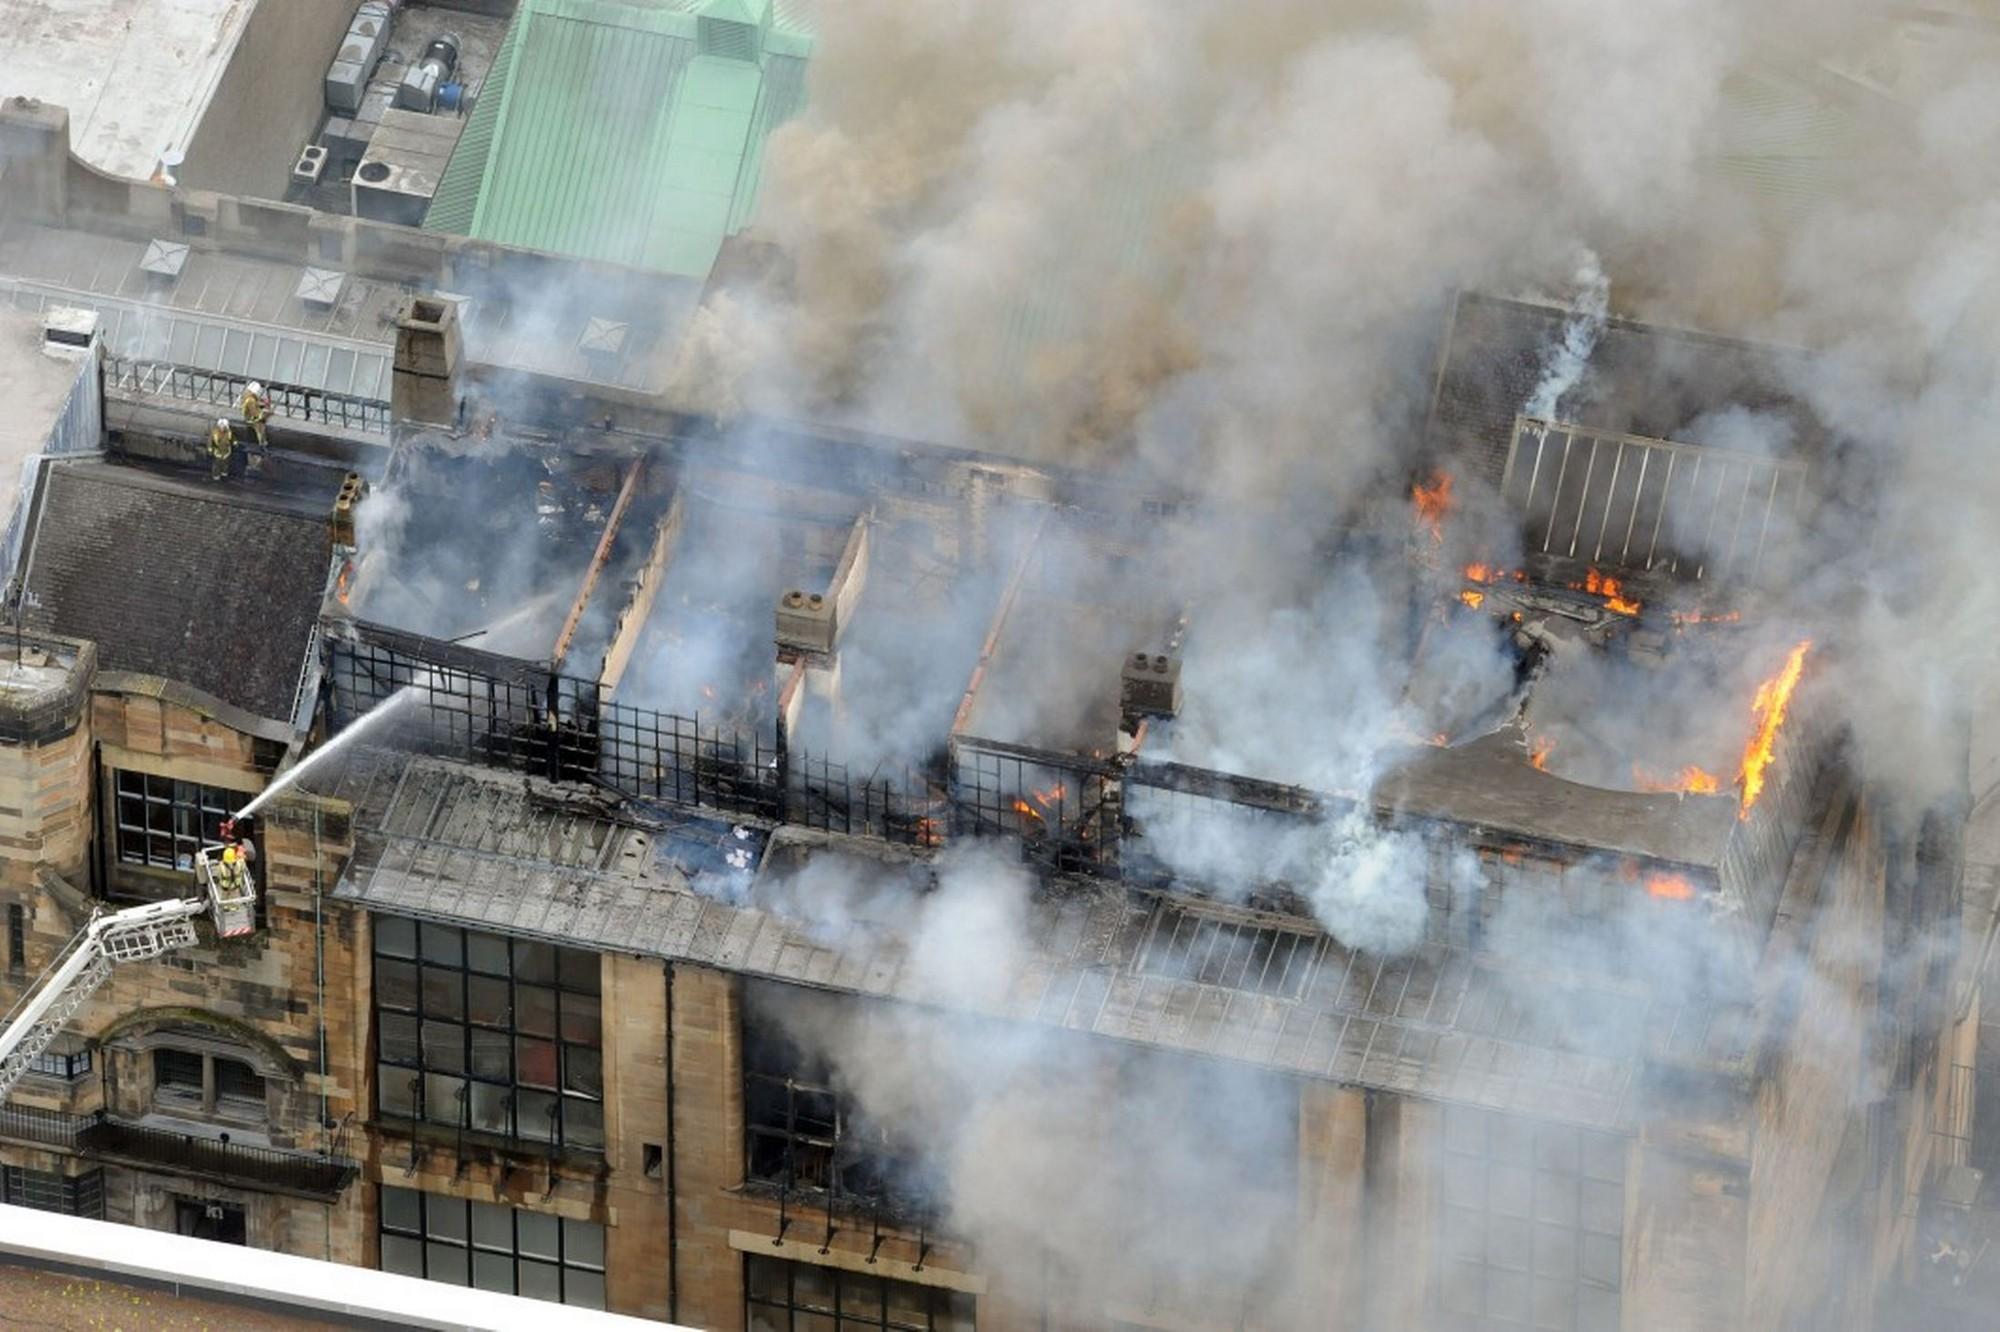 Two Symposiums Will Help Determine Glasgow School of Art's Restoration, Glasgow School of Art ablaze (unknown source)